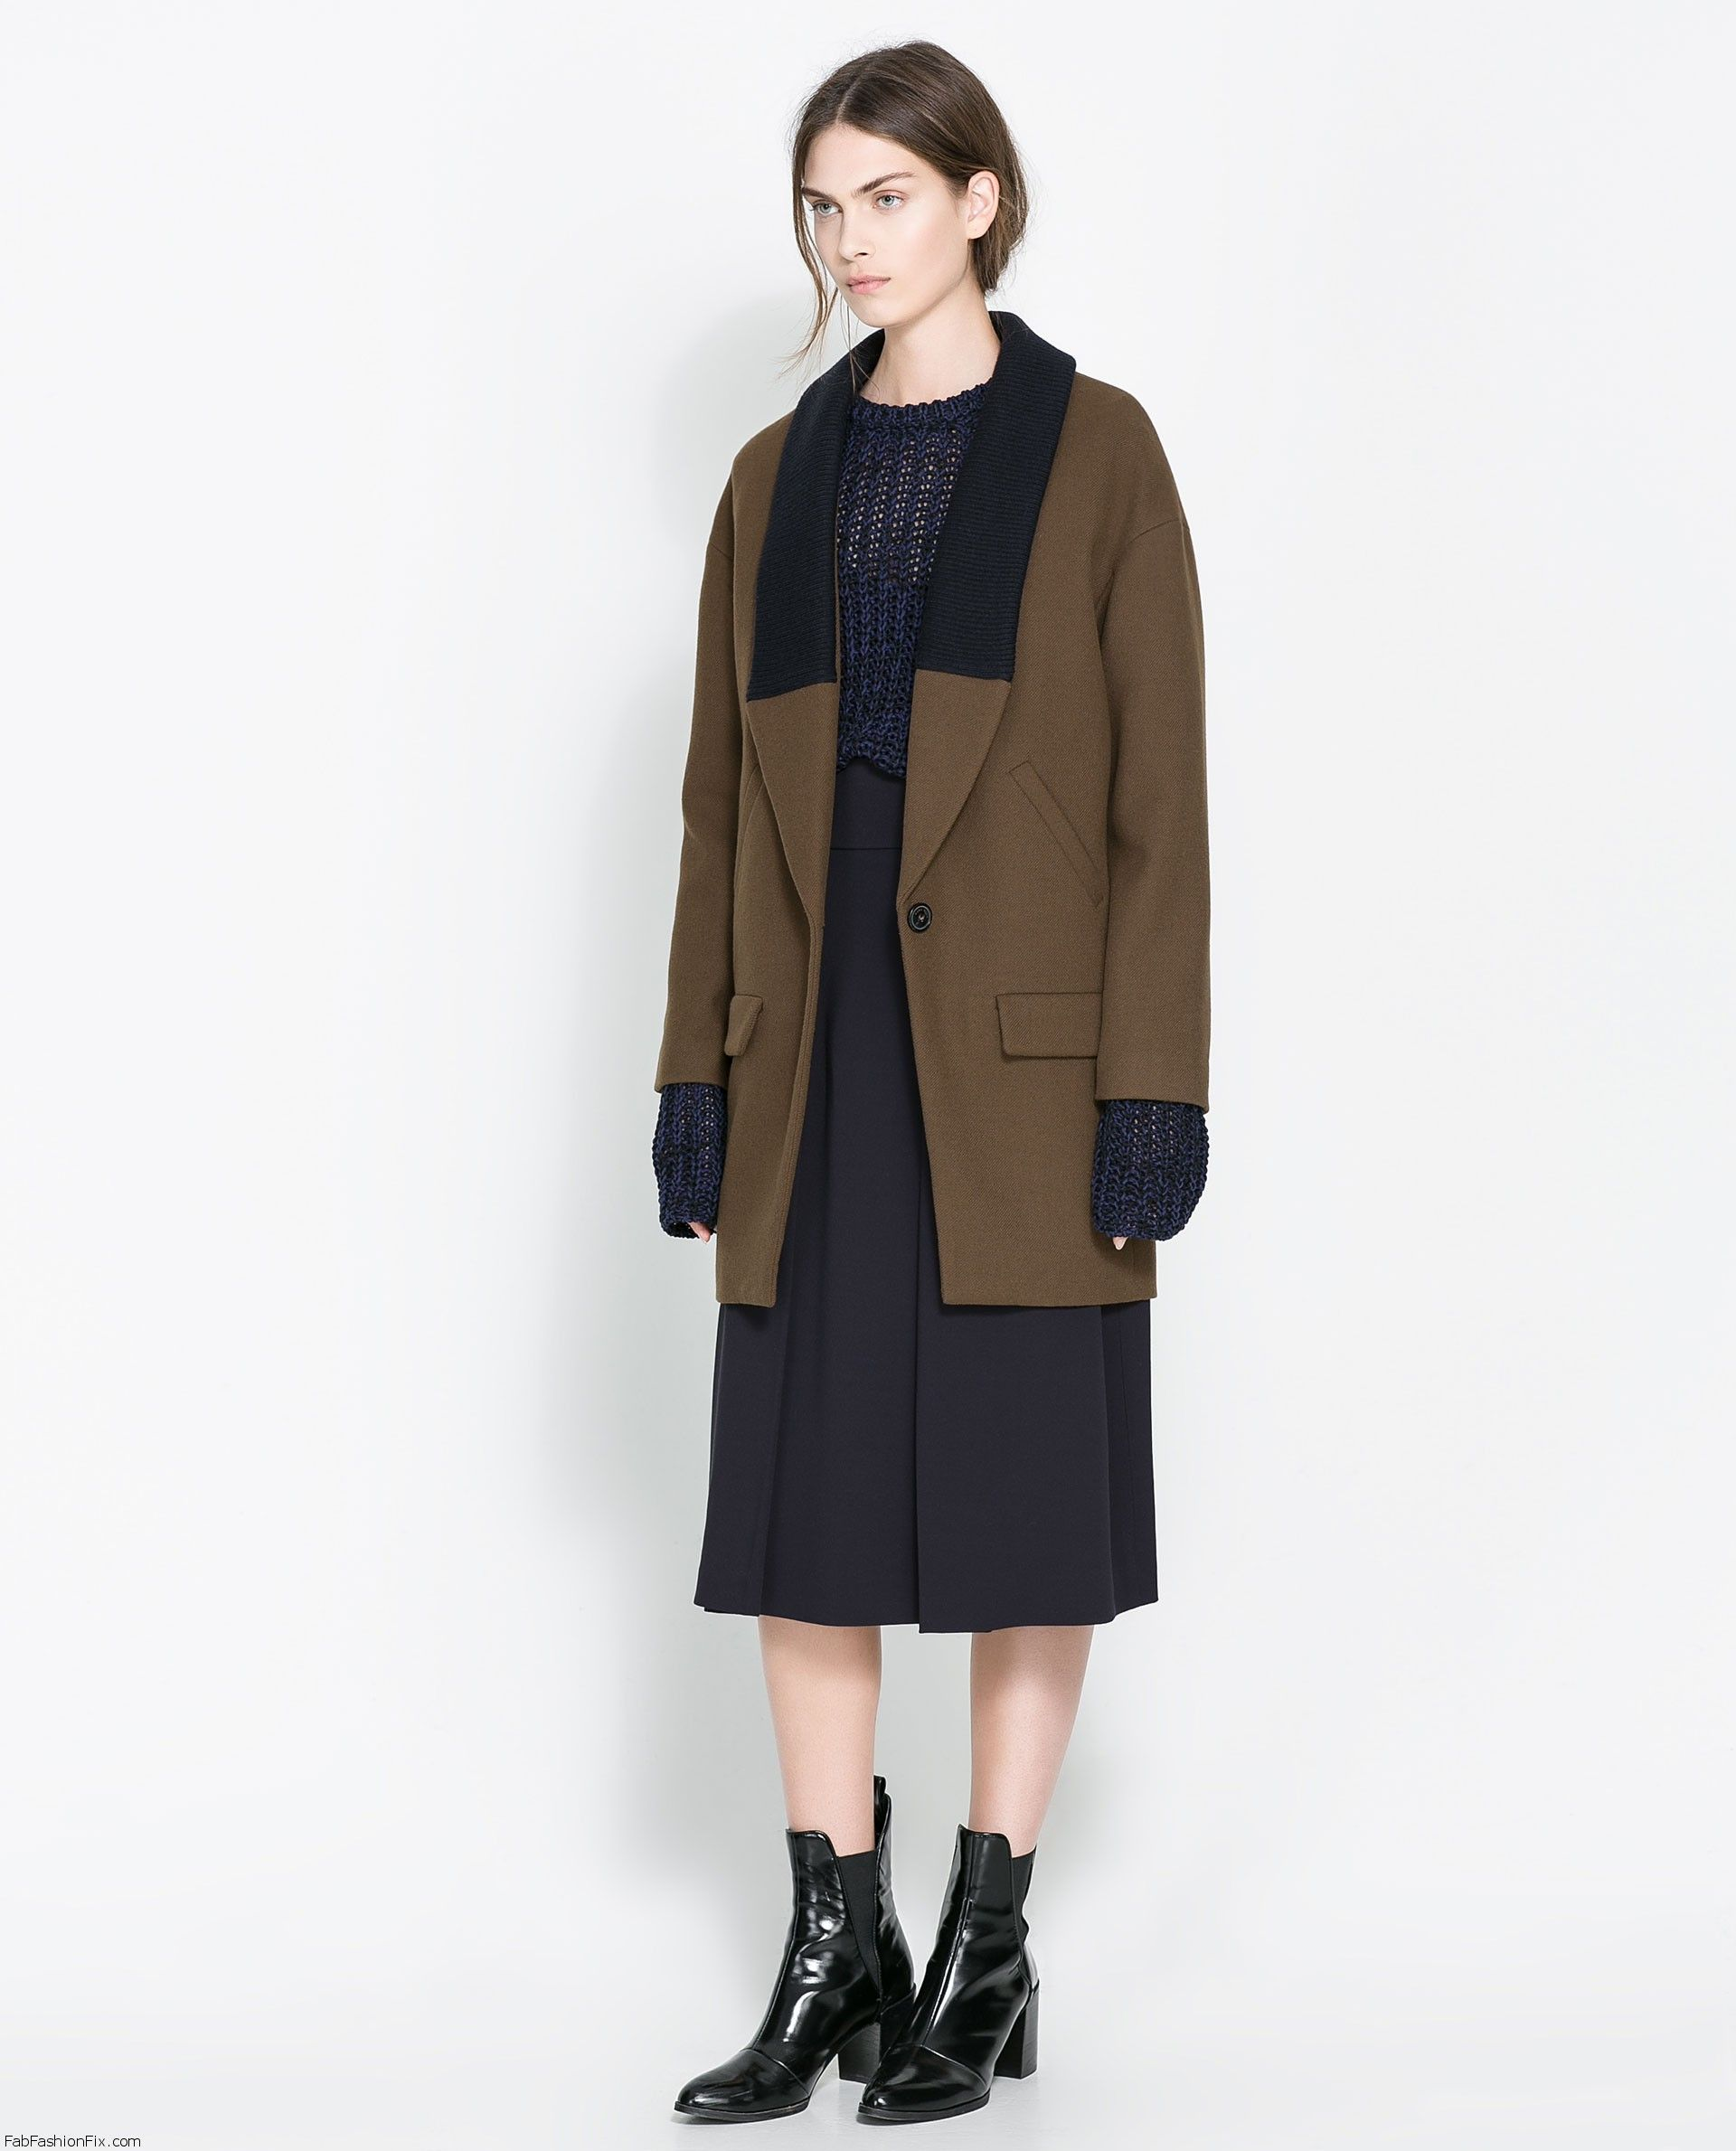 Zara Women Winter Coats - Tradingbasis